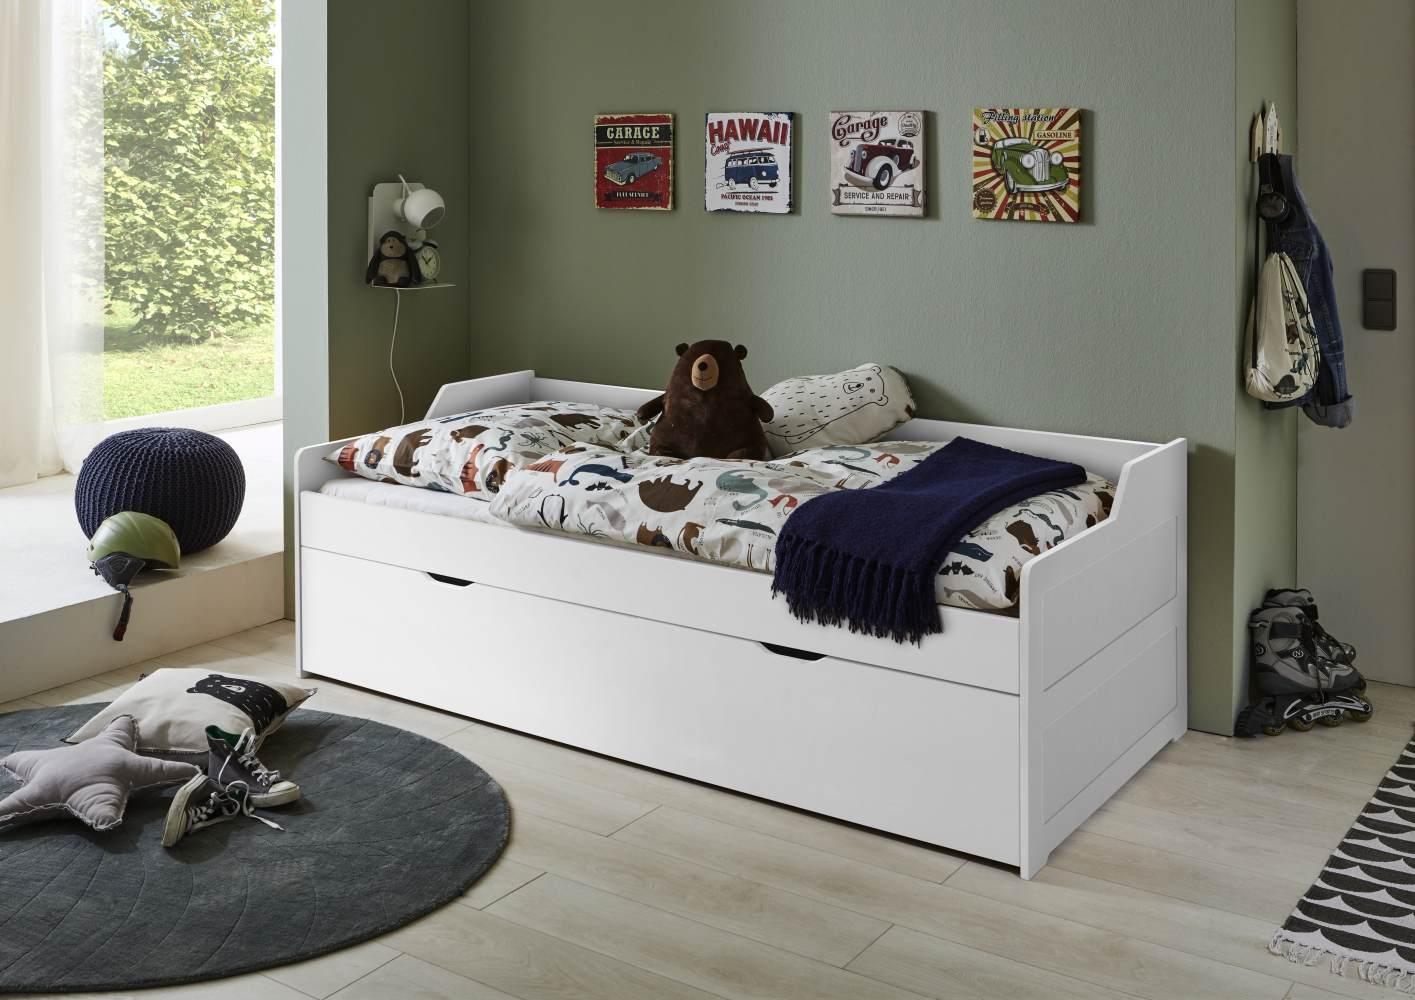 Relita 'LILLY' Kojenbett 90x200 Buche massiv, weiß lackiert, inkl Bettkasten Bild 1